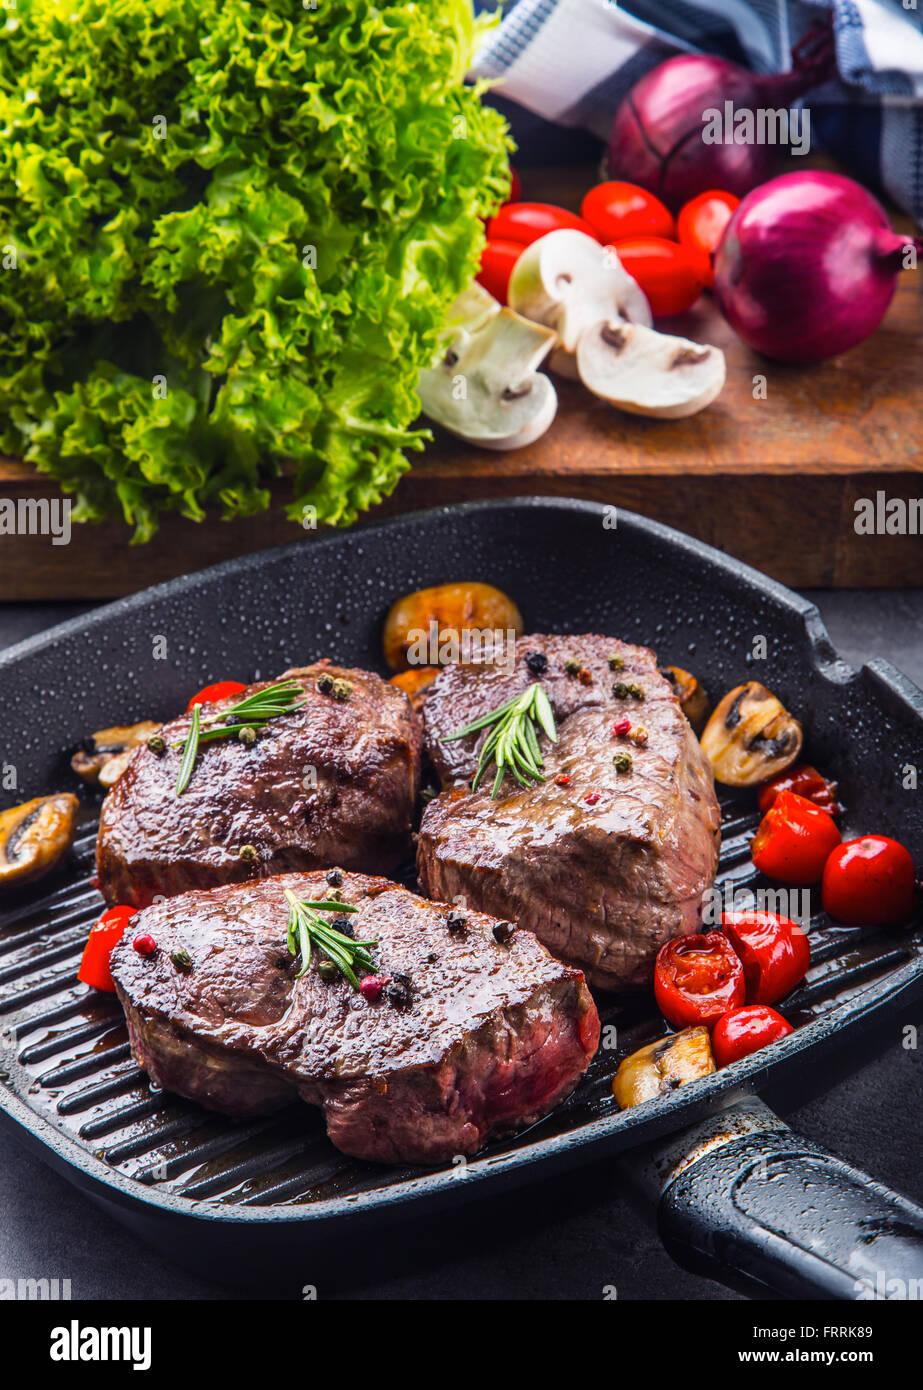 steak grill beefsteak portionen dicke saftige roastbeef rindersteaks auf grill teflon pfanne. Black Bedroom Furniture Sets. Home Design Ideas